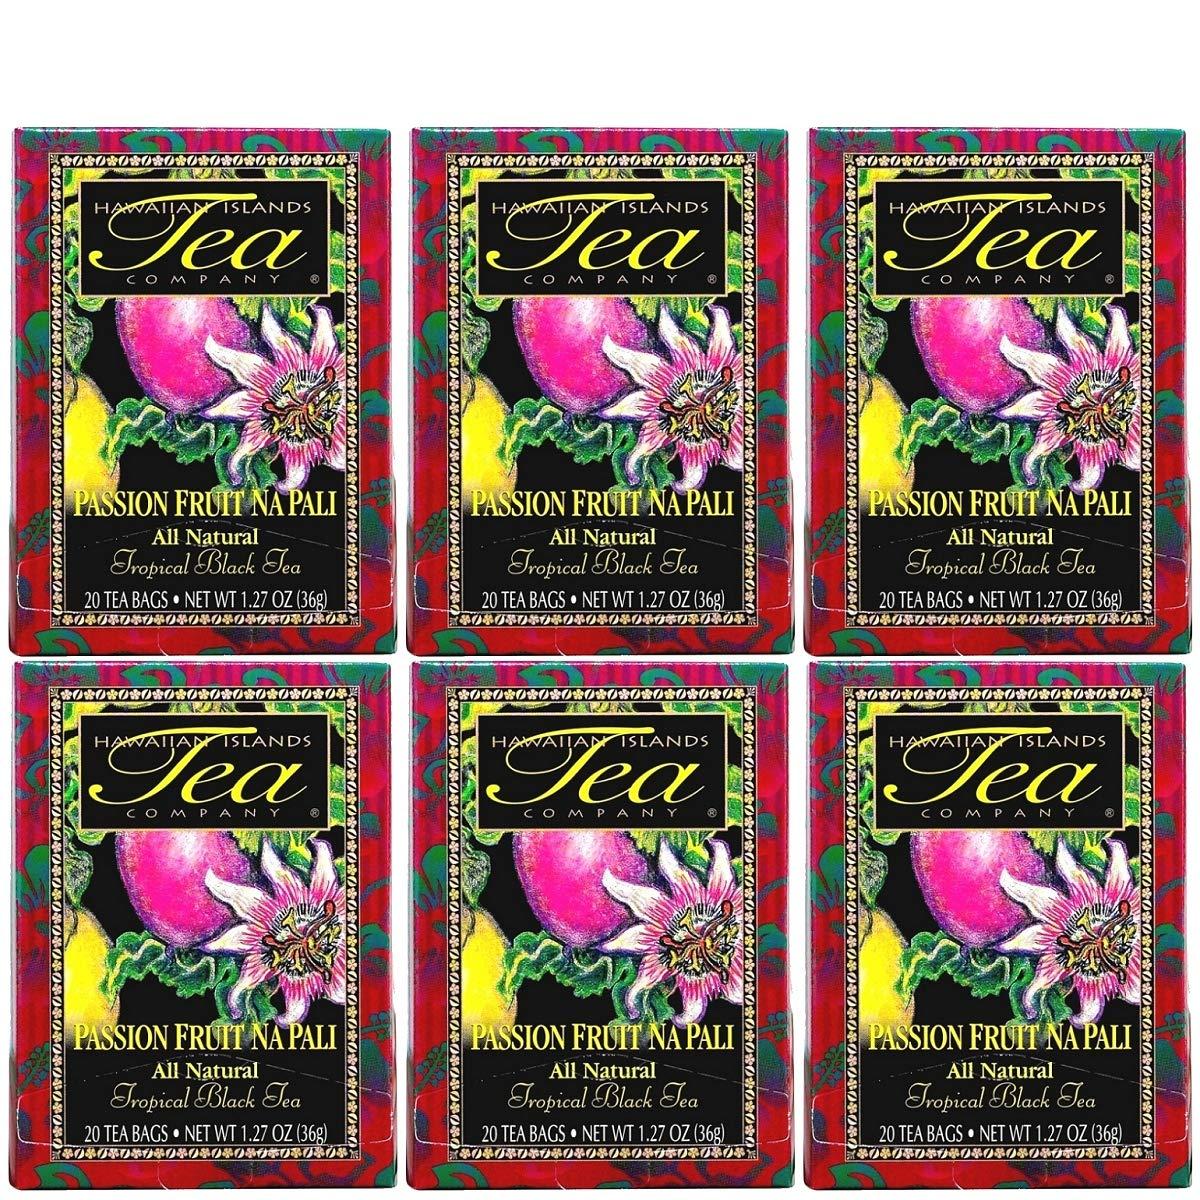 Hawaiian Islands Passion Fruit Na Pali Tropical Black Tea, All Natural - 20 Teabags (6 Boxes)